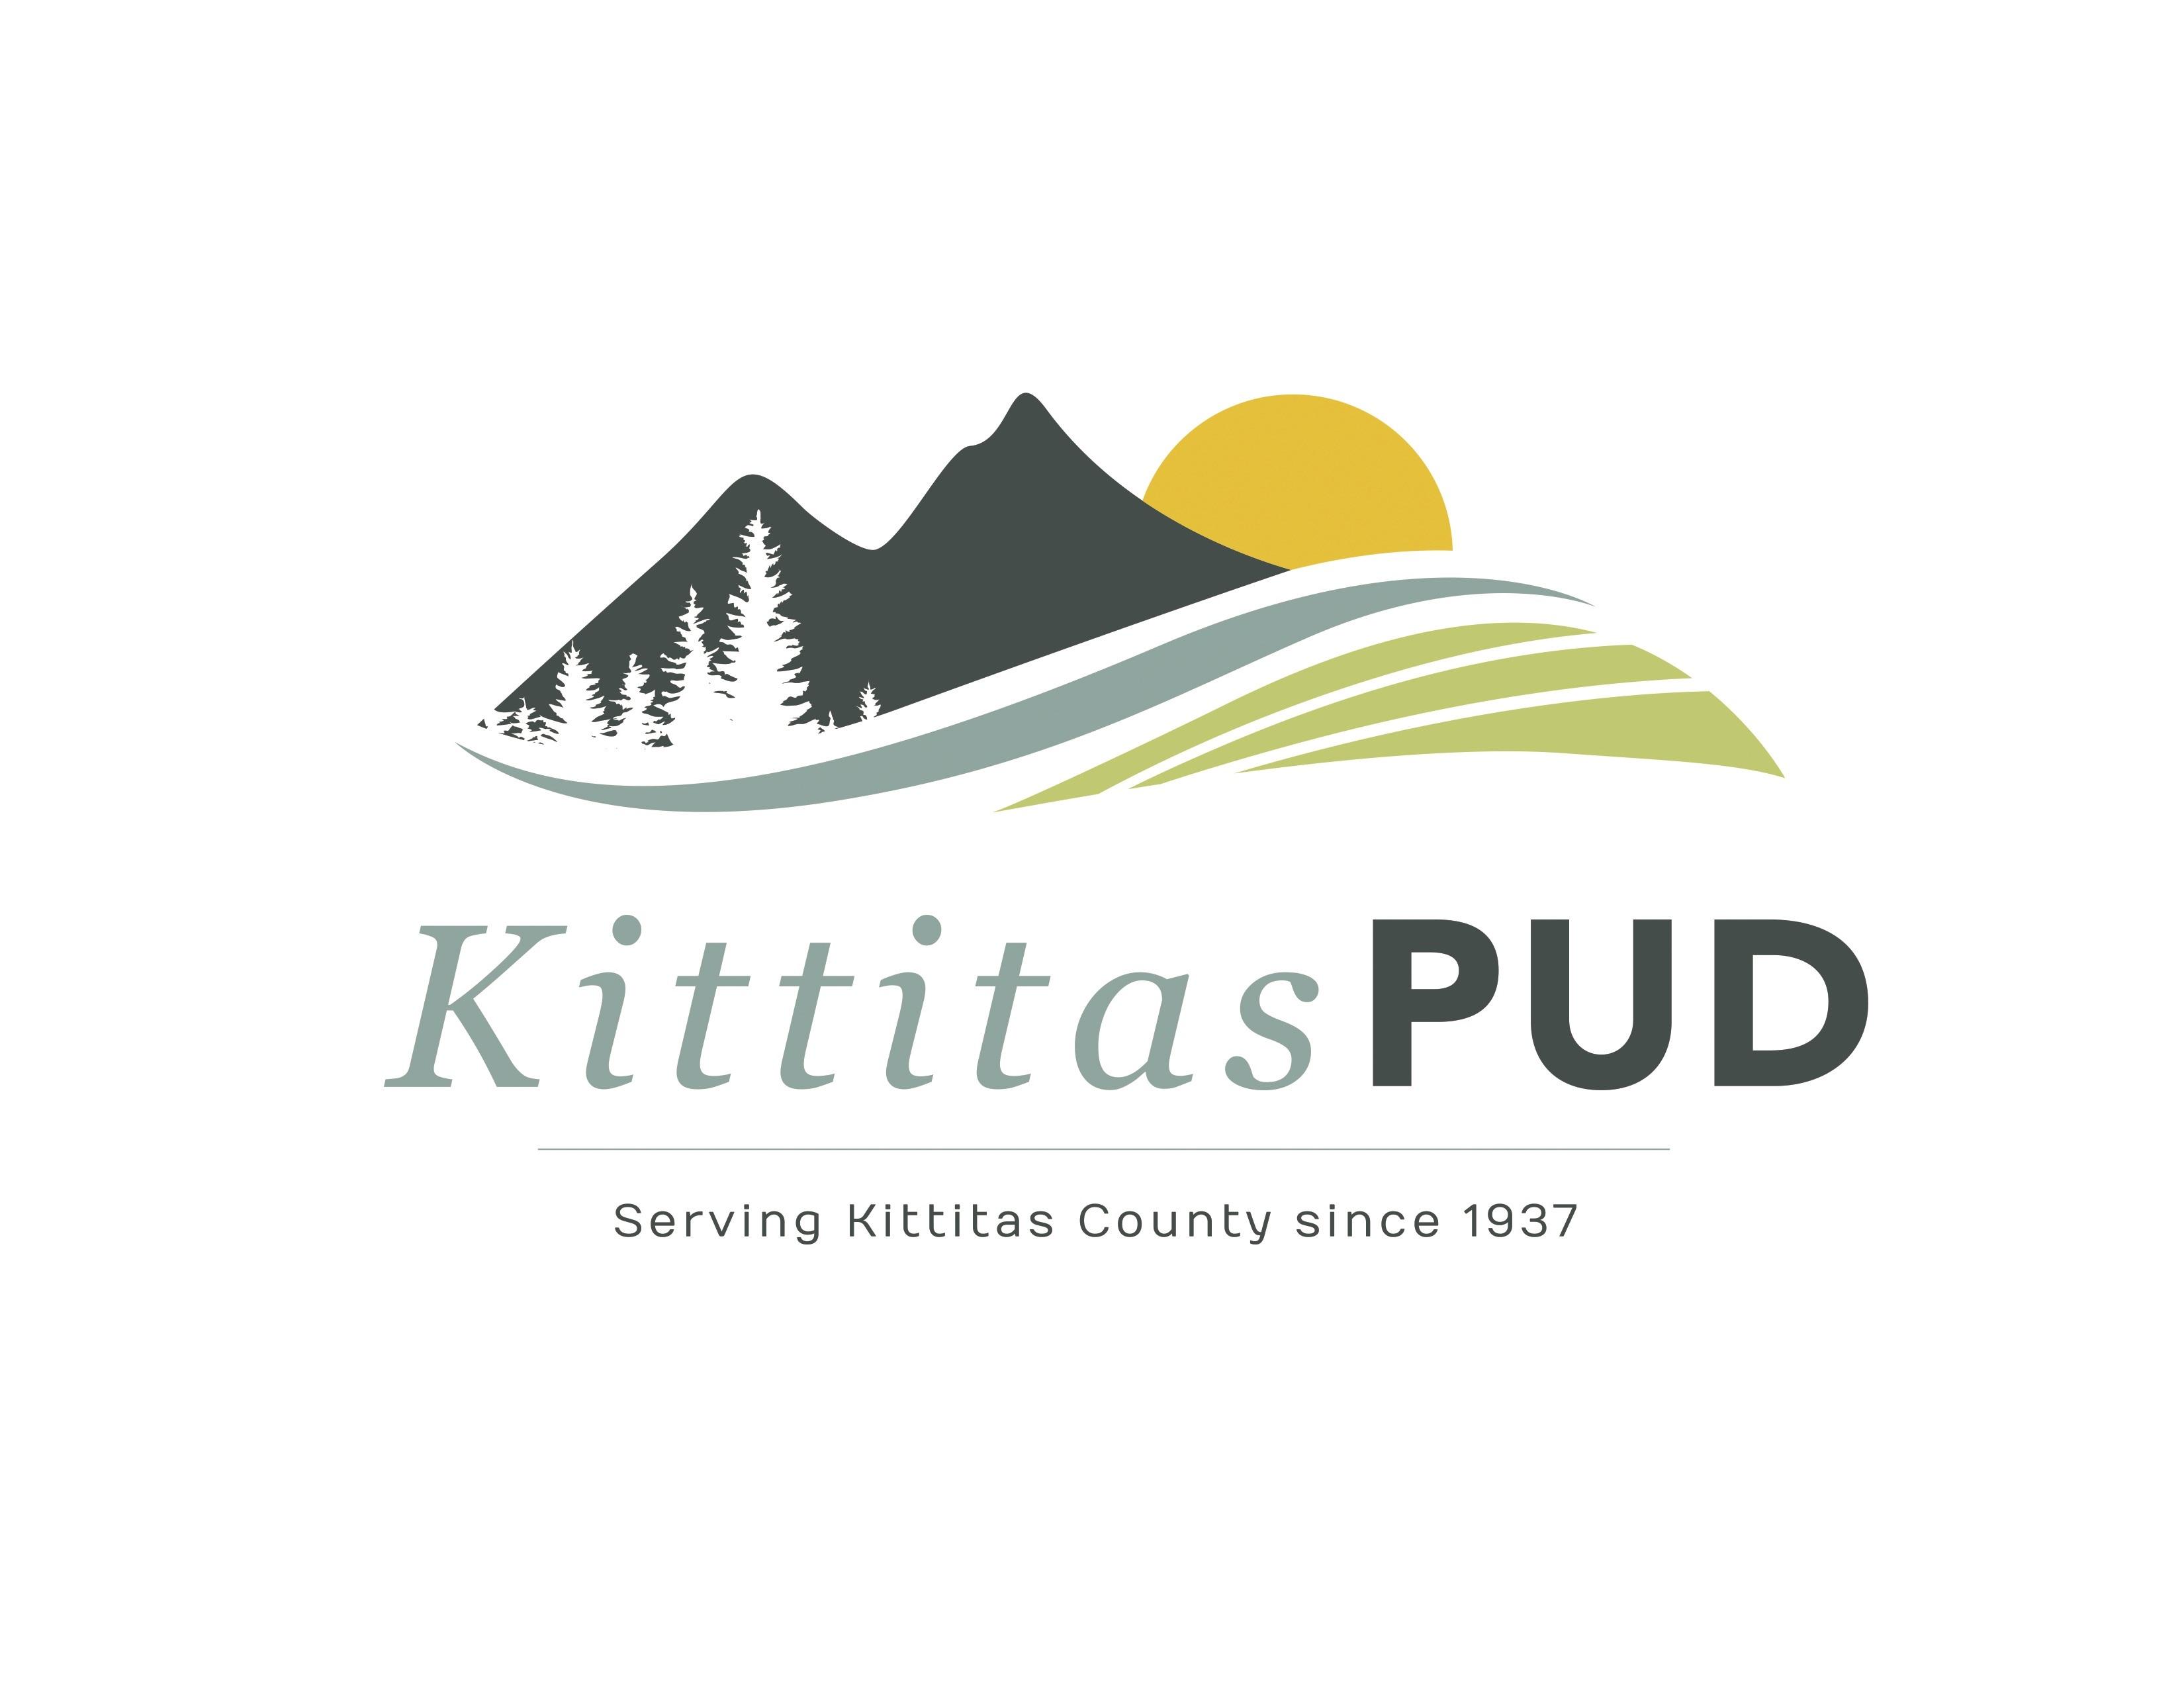 Kittitas PUD